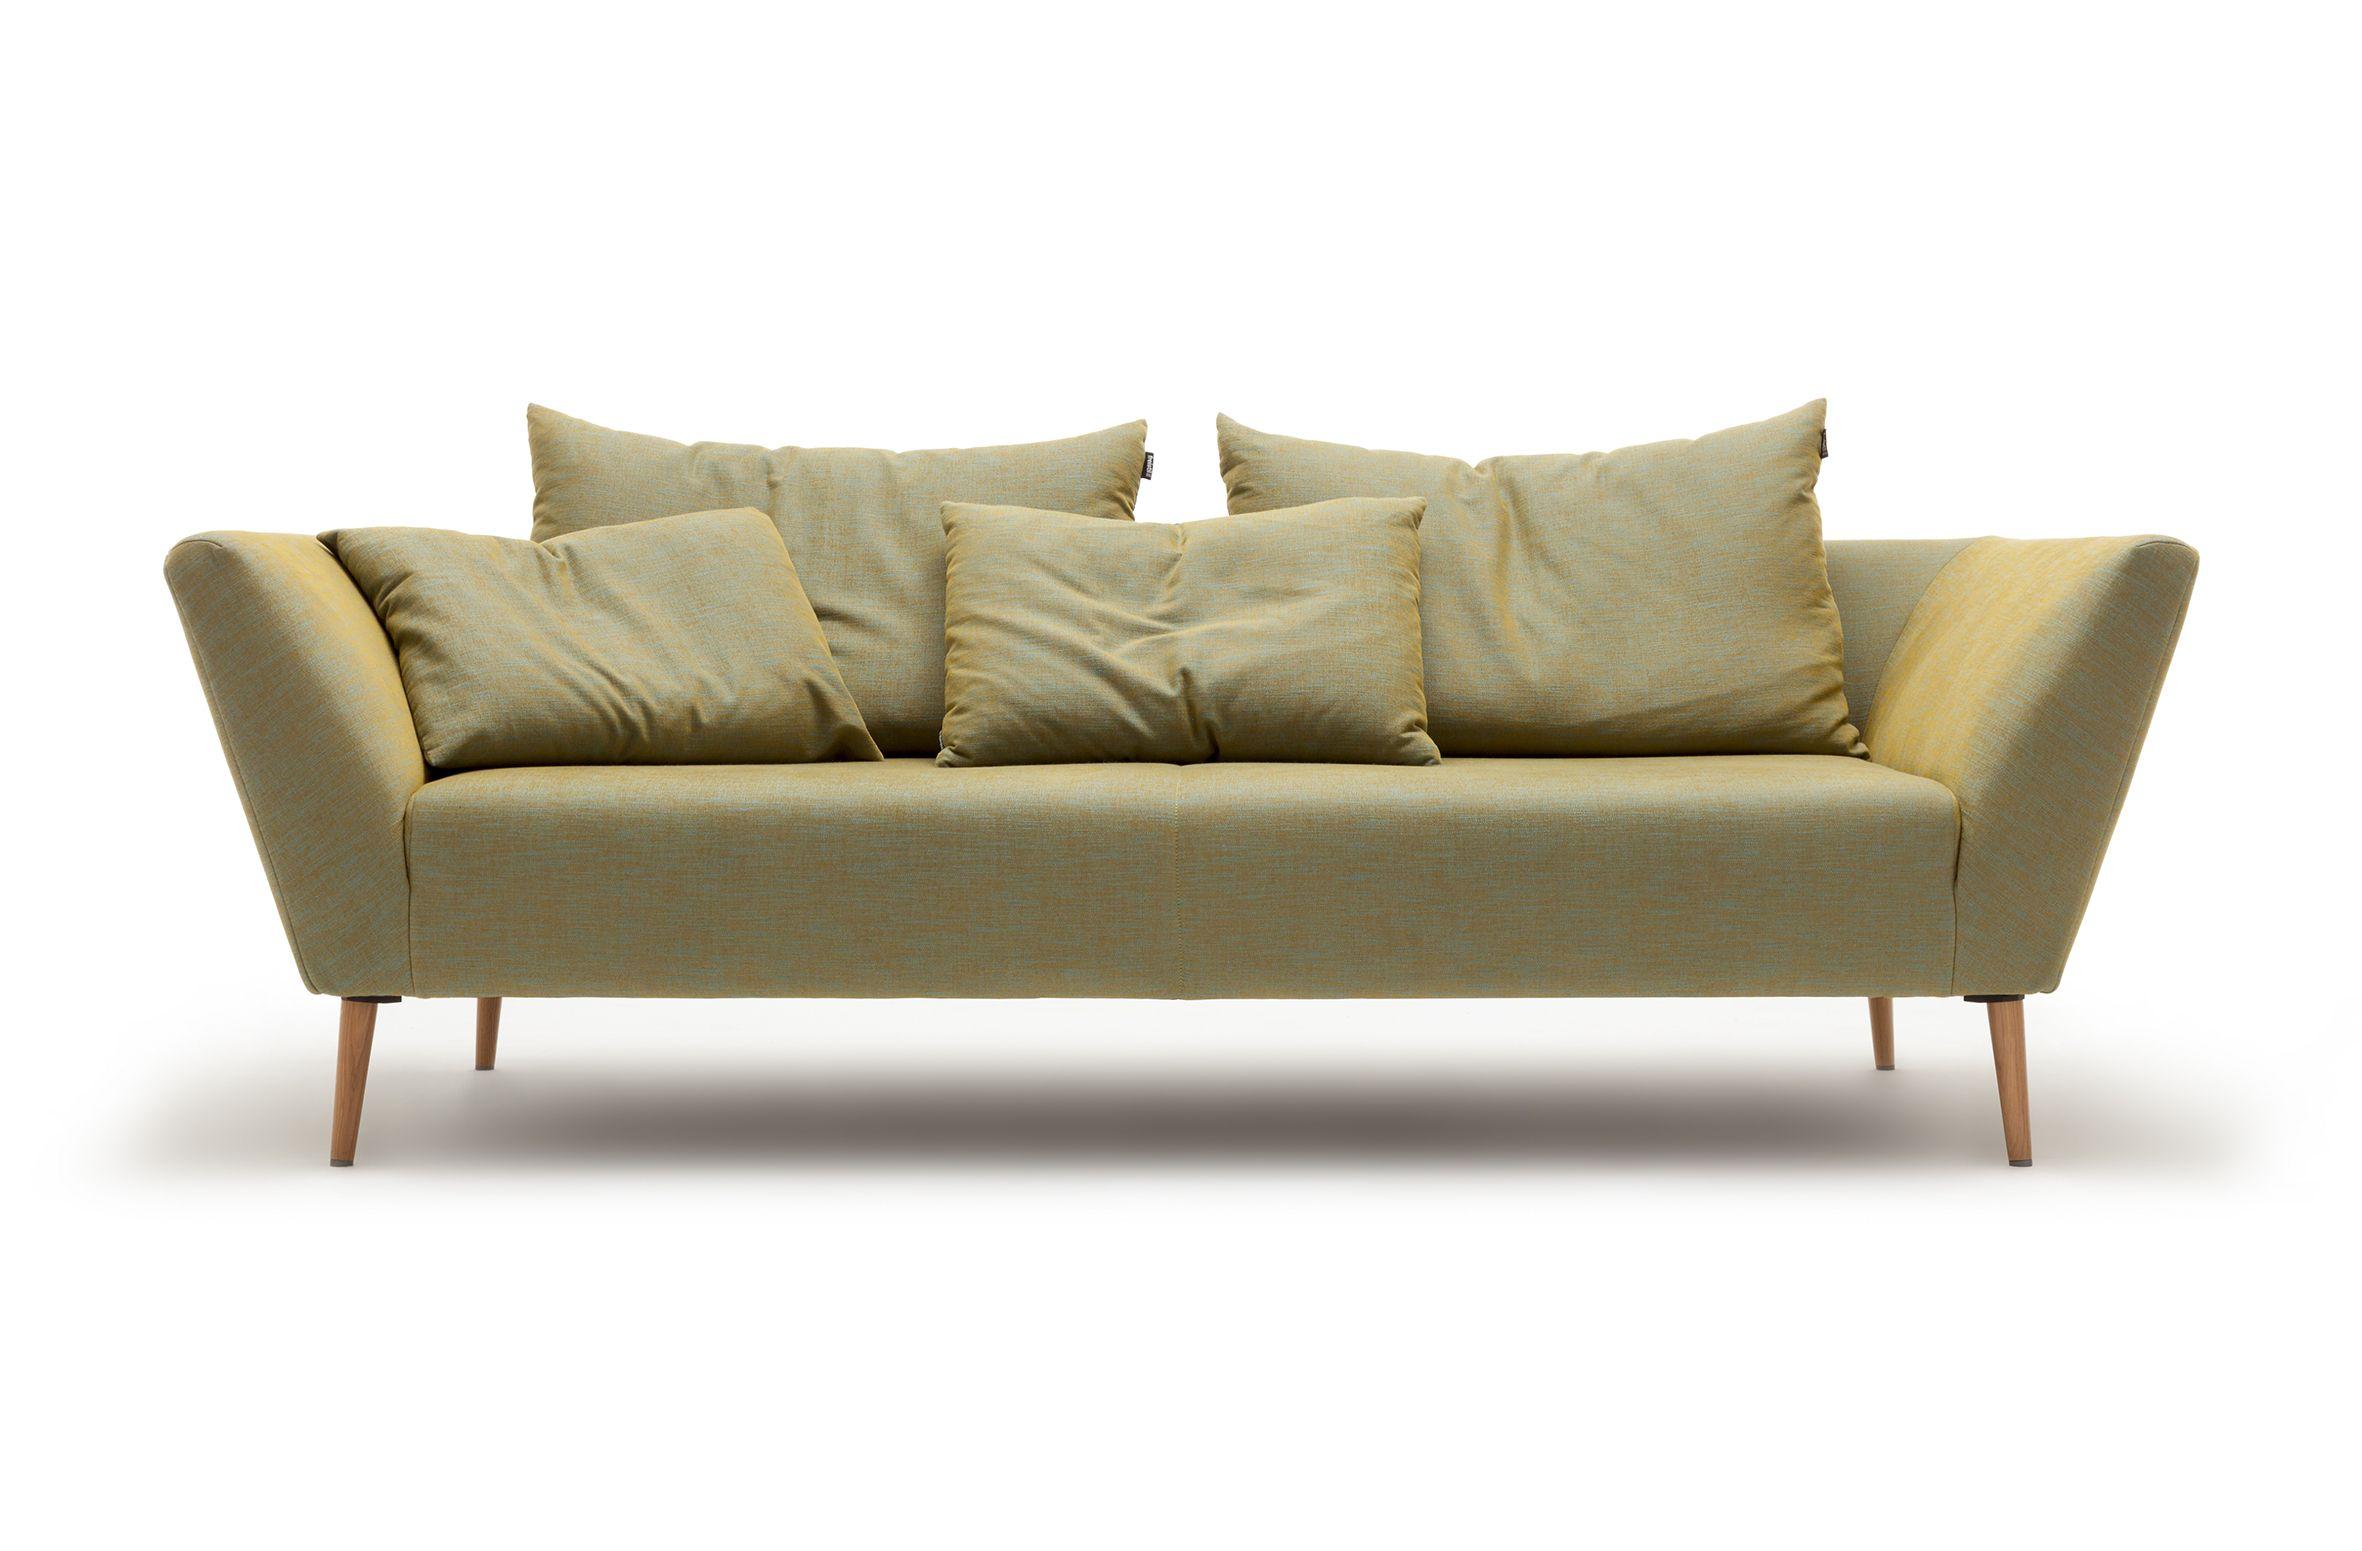 comfortable rolf benz sofa. Sofa Freistil 176 Rolf Benz Comfortable